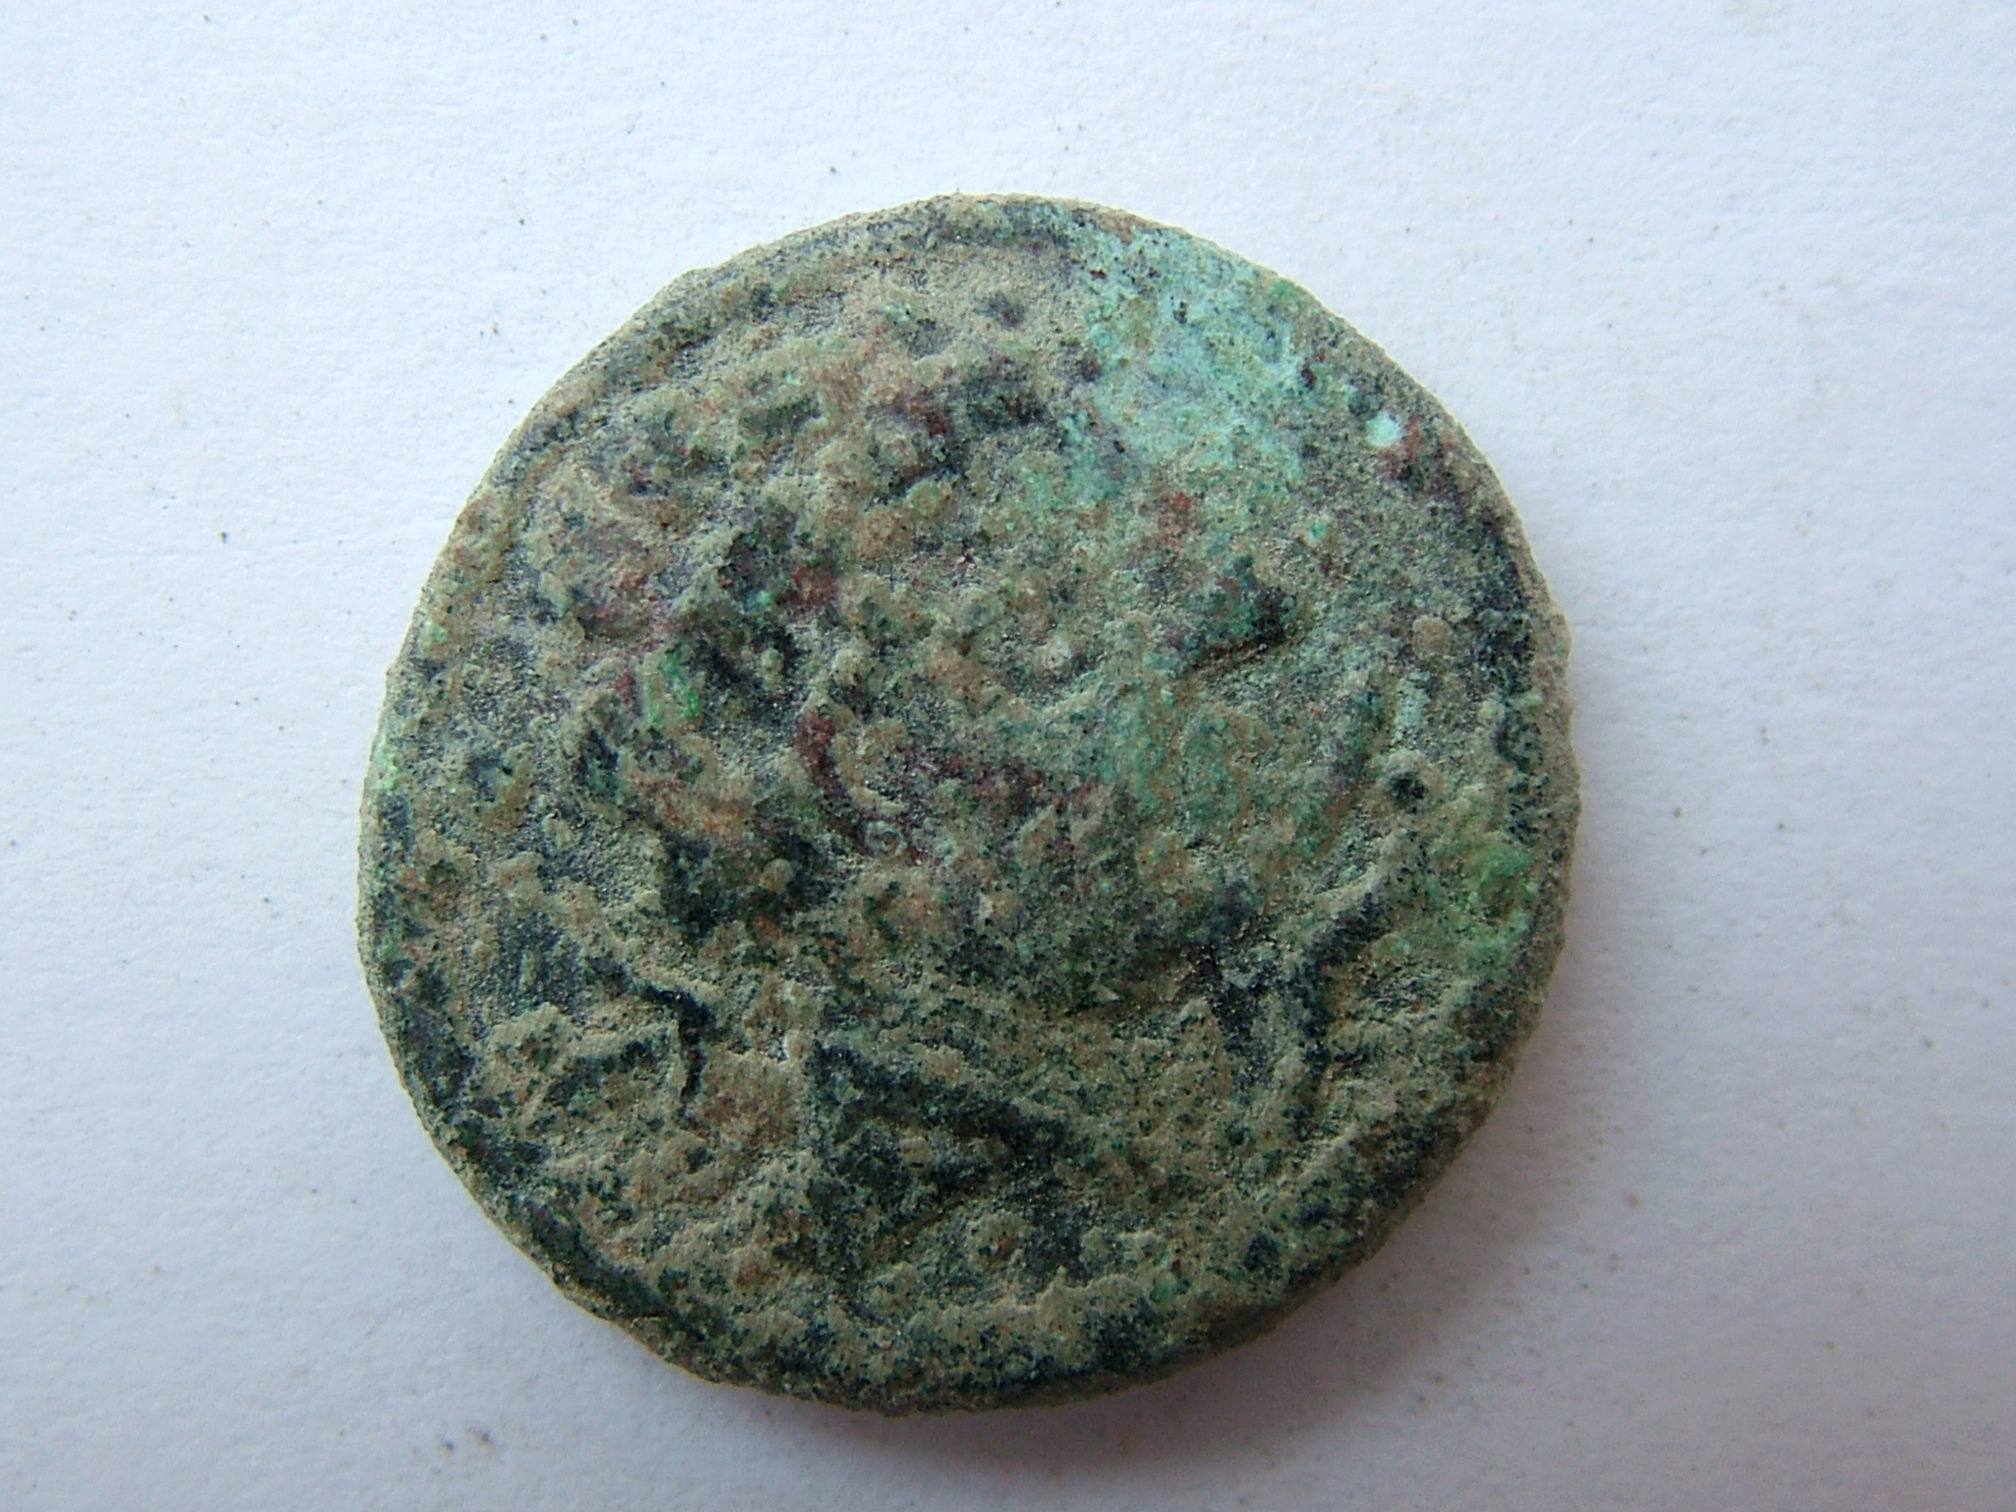 Imágenes a gran escala de pátinas y monedas falsas. Escalofriante (+18). 07_uar10